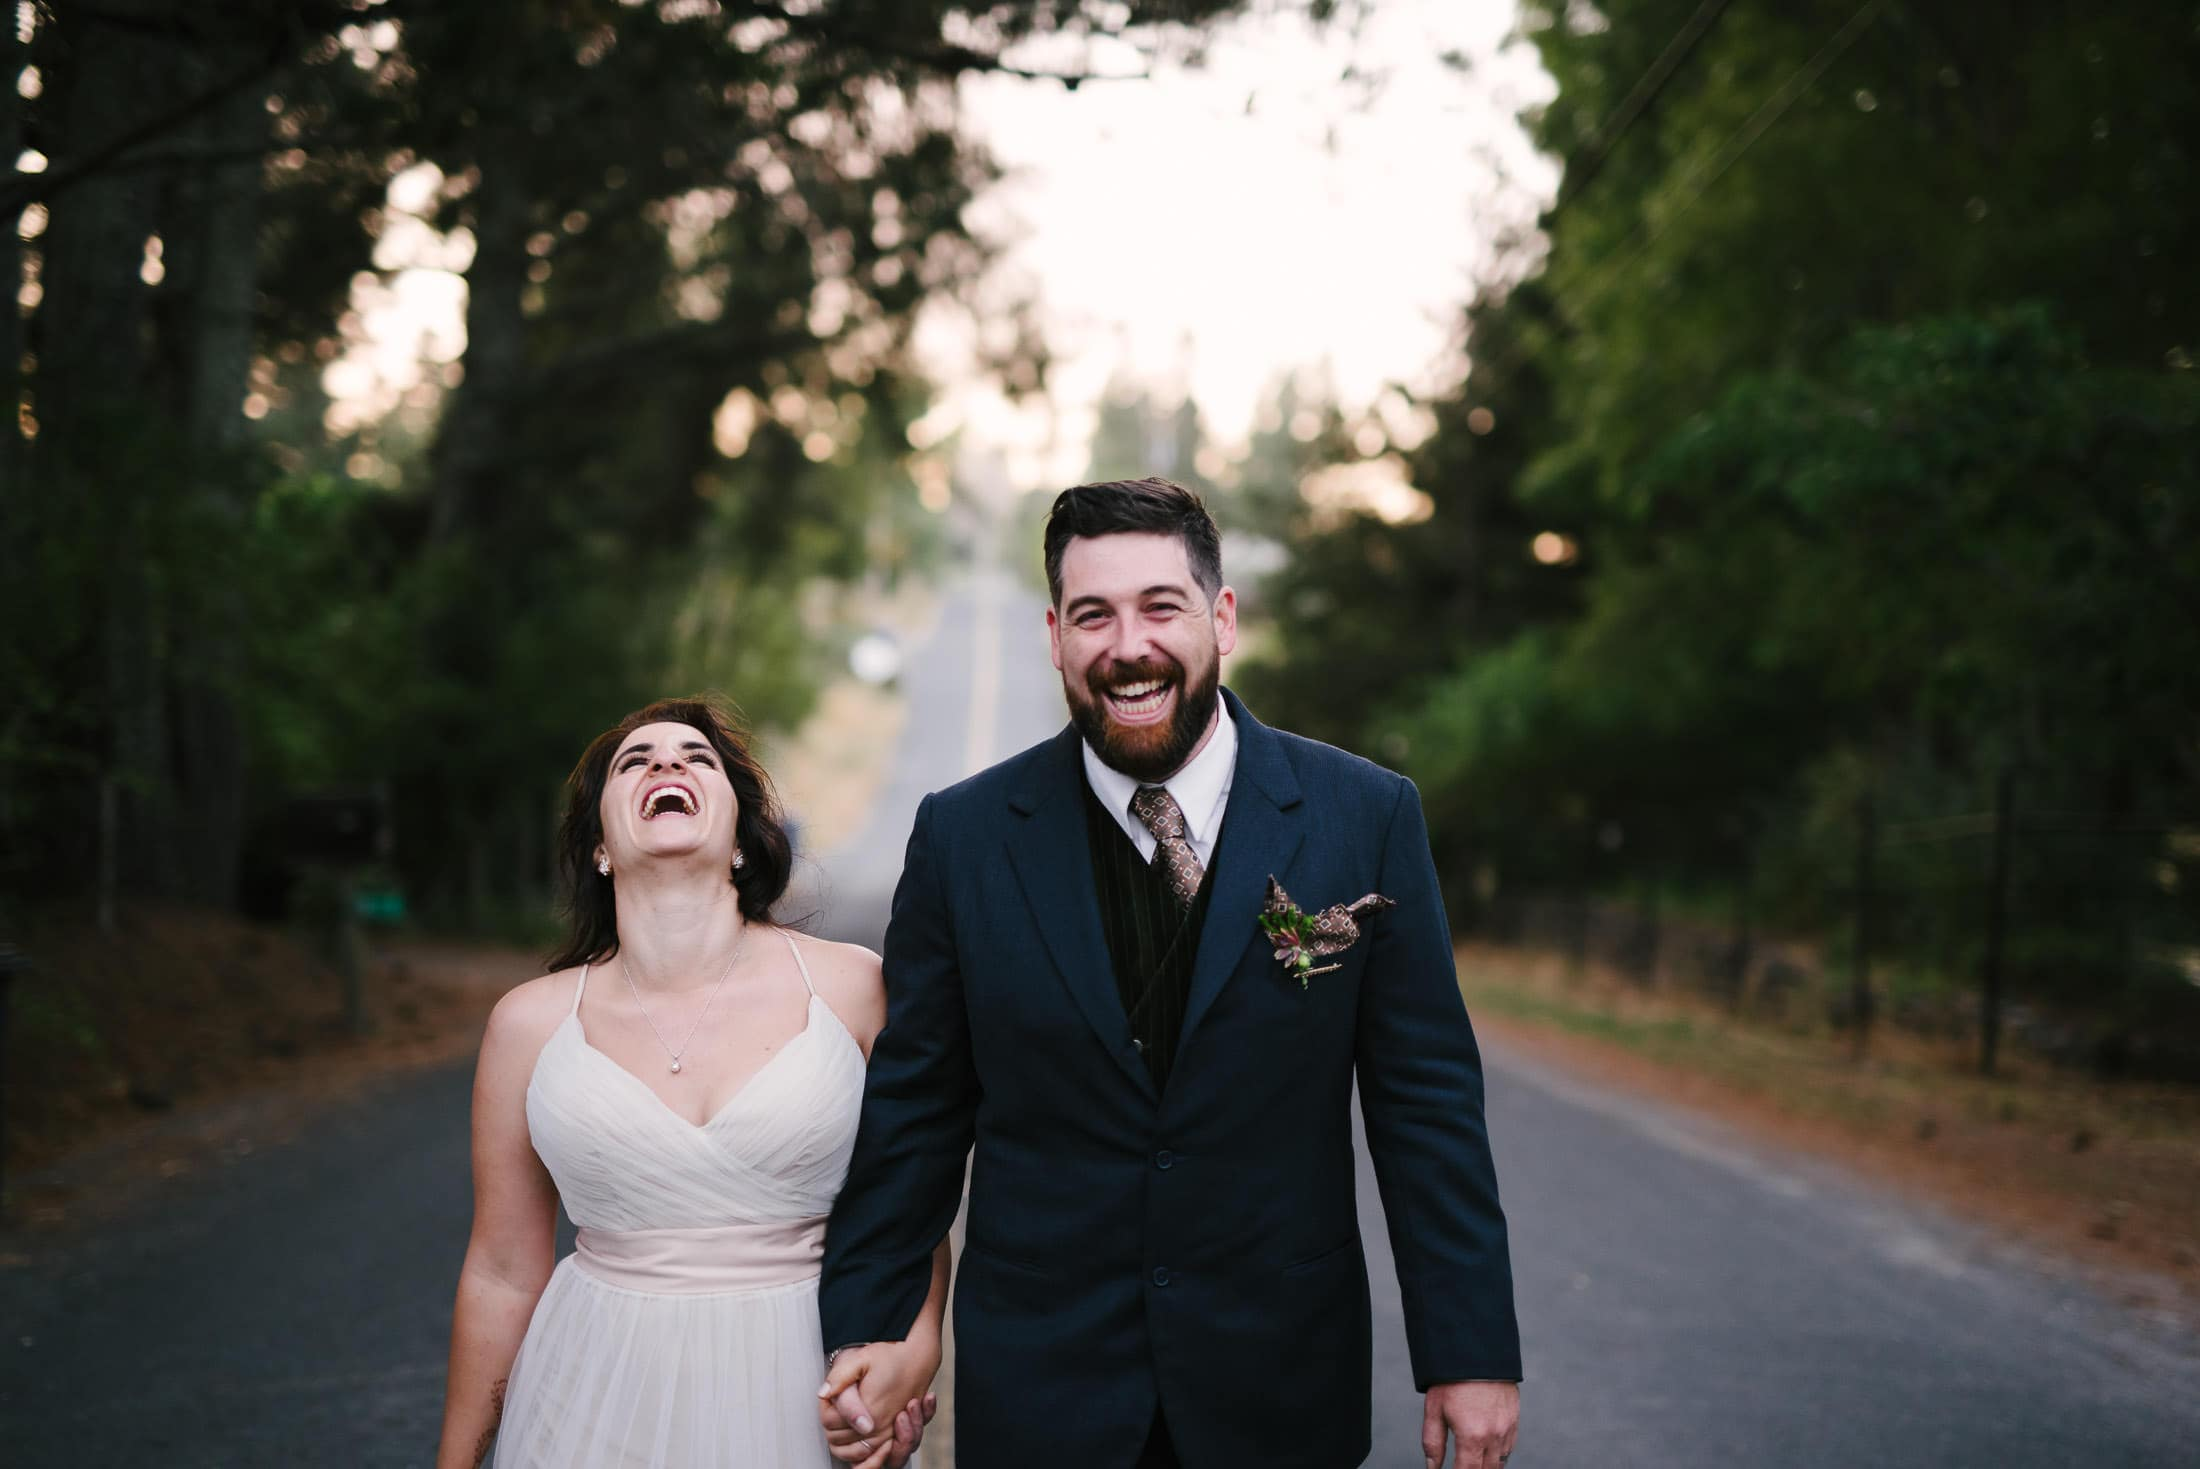 Wedding in Sebastopol Couple Portrait